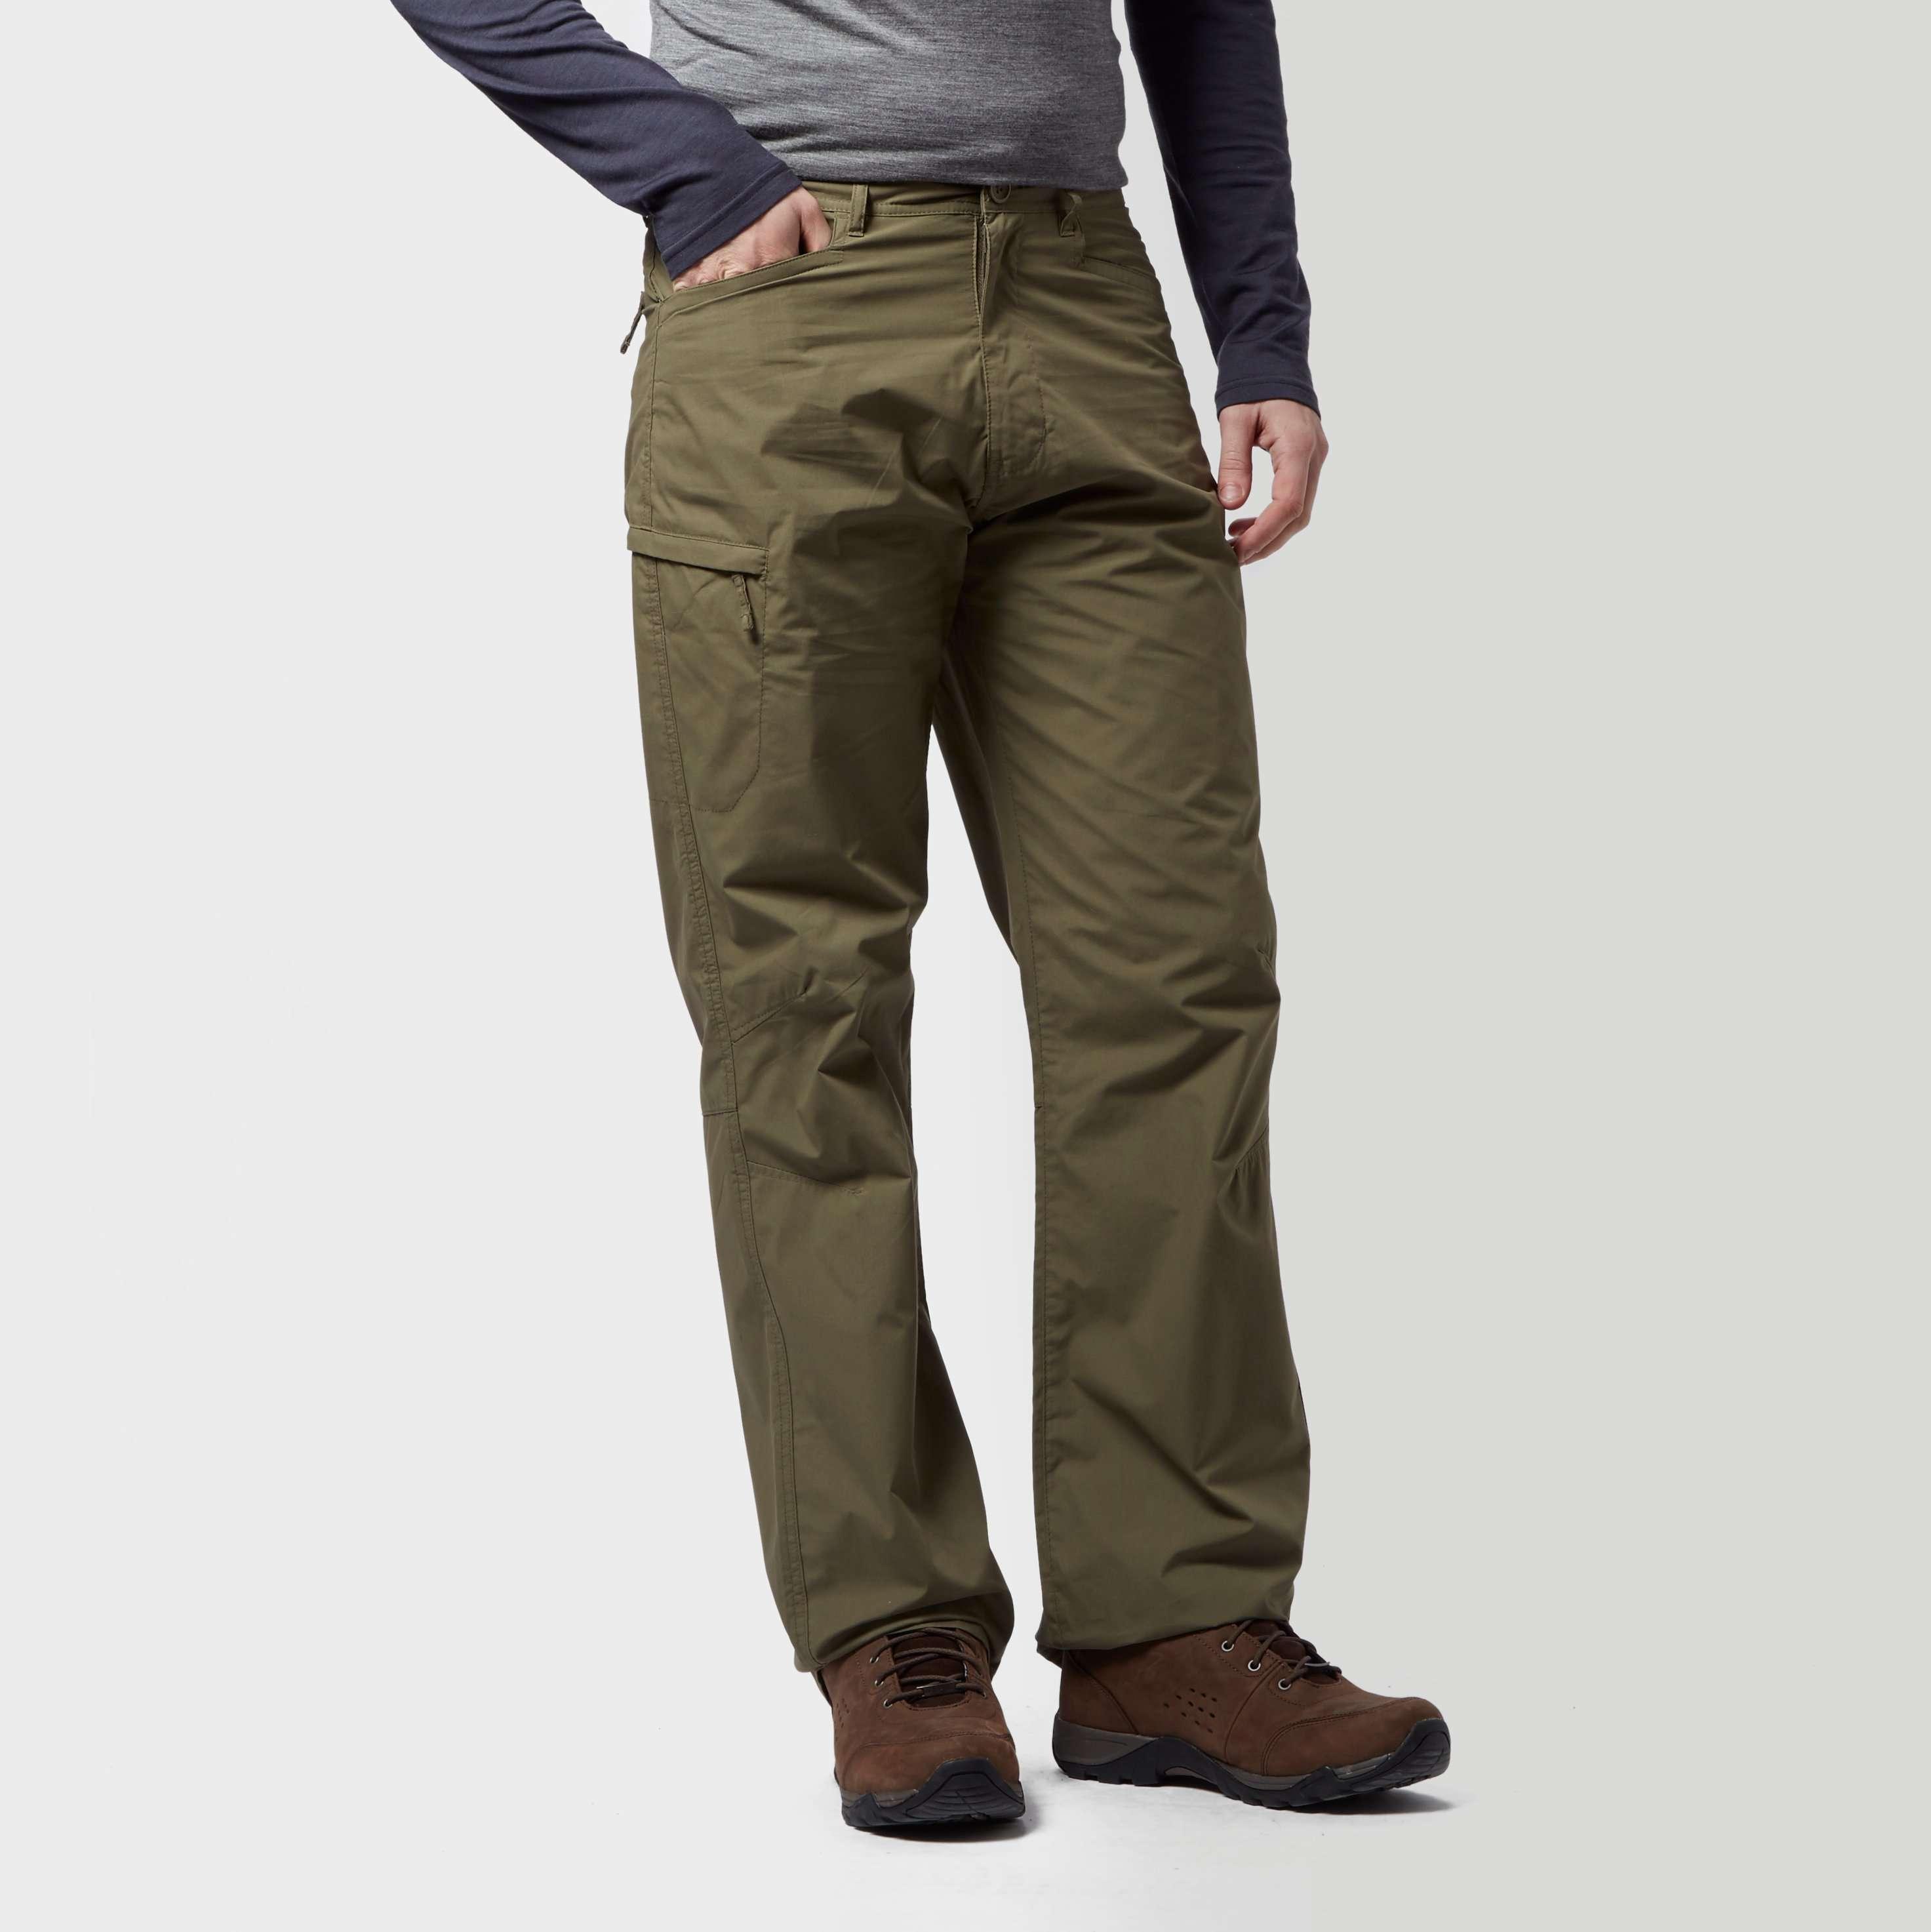 PETER STORM Men's Ramble Walking Trousers